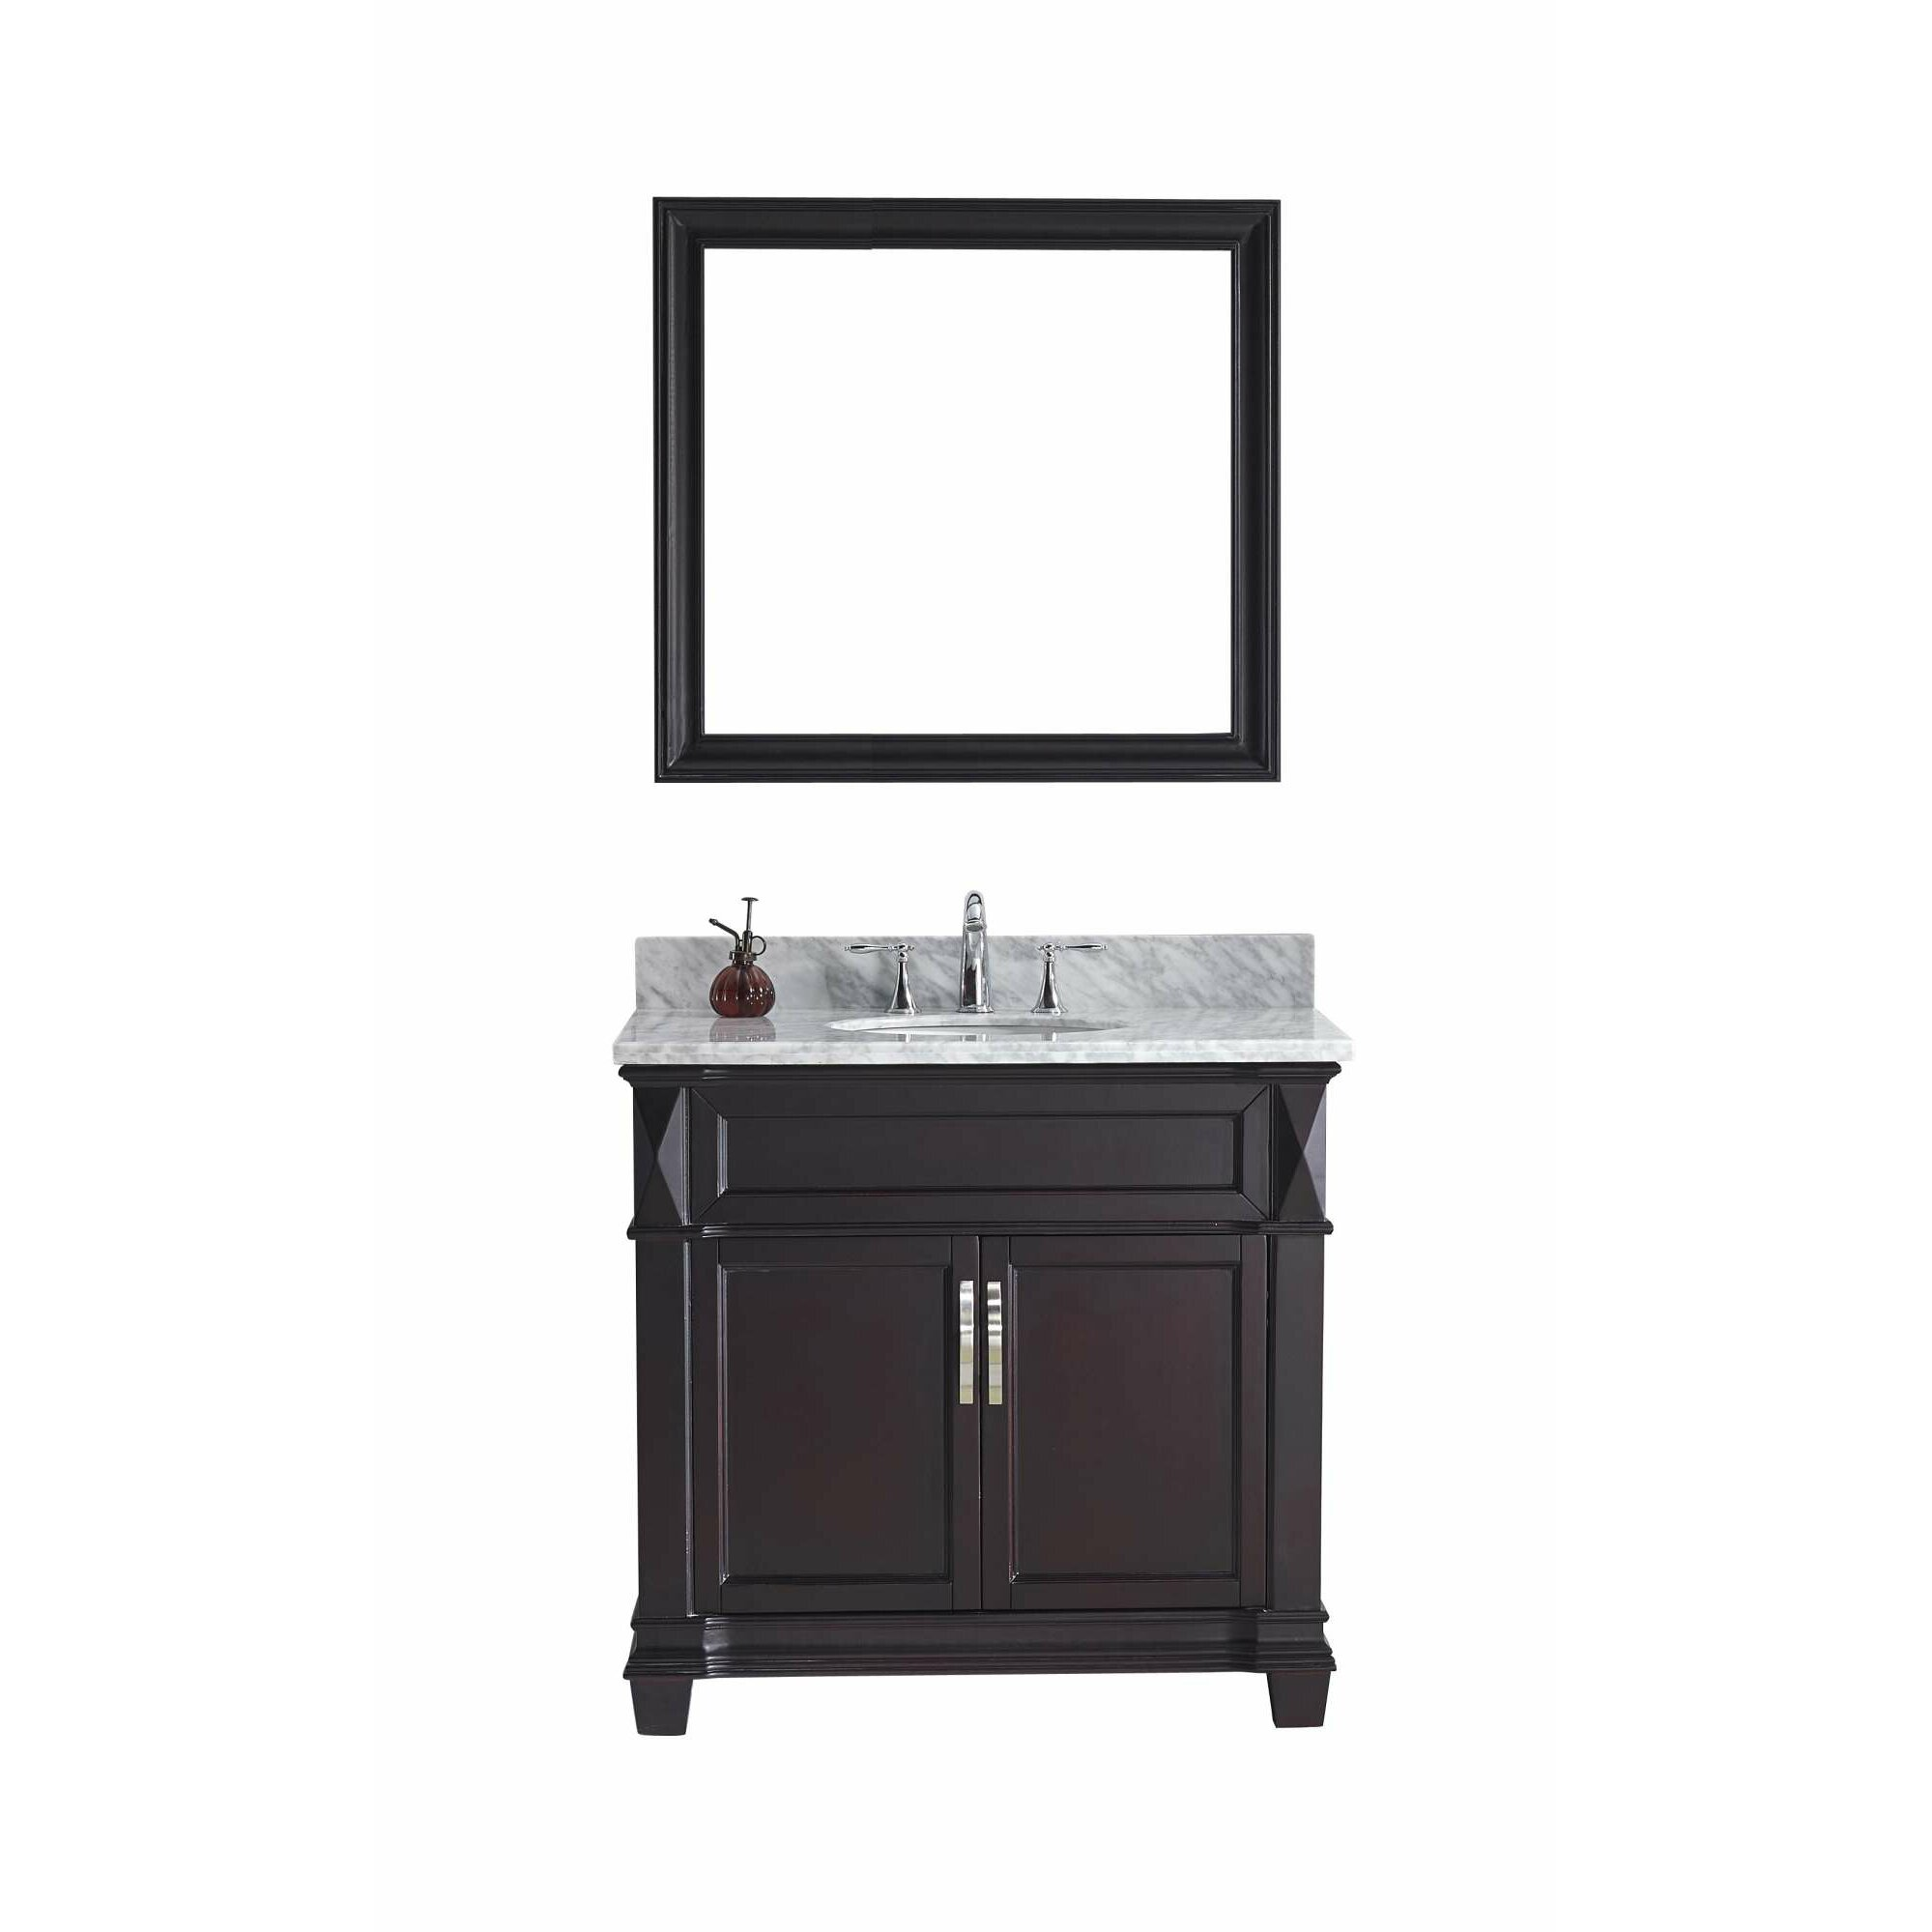 Marble top bathroom cabinet